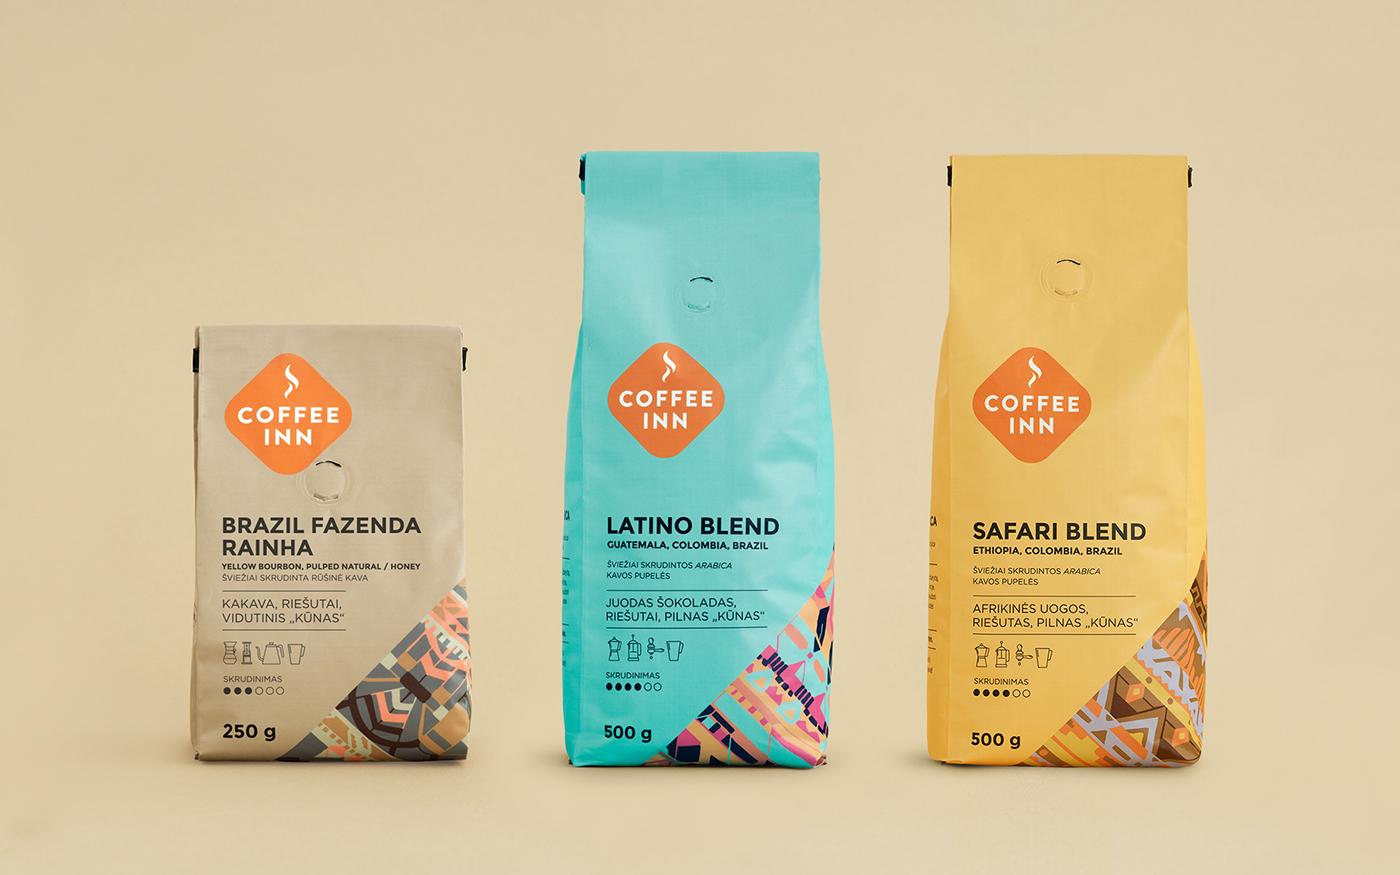 COFFEE INN Coffee On Behance